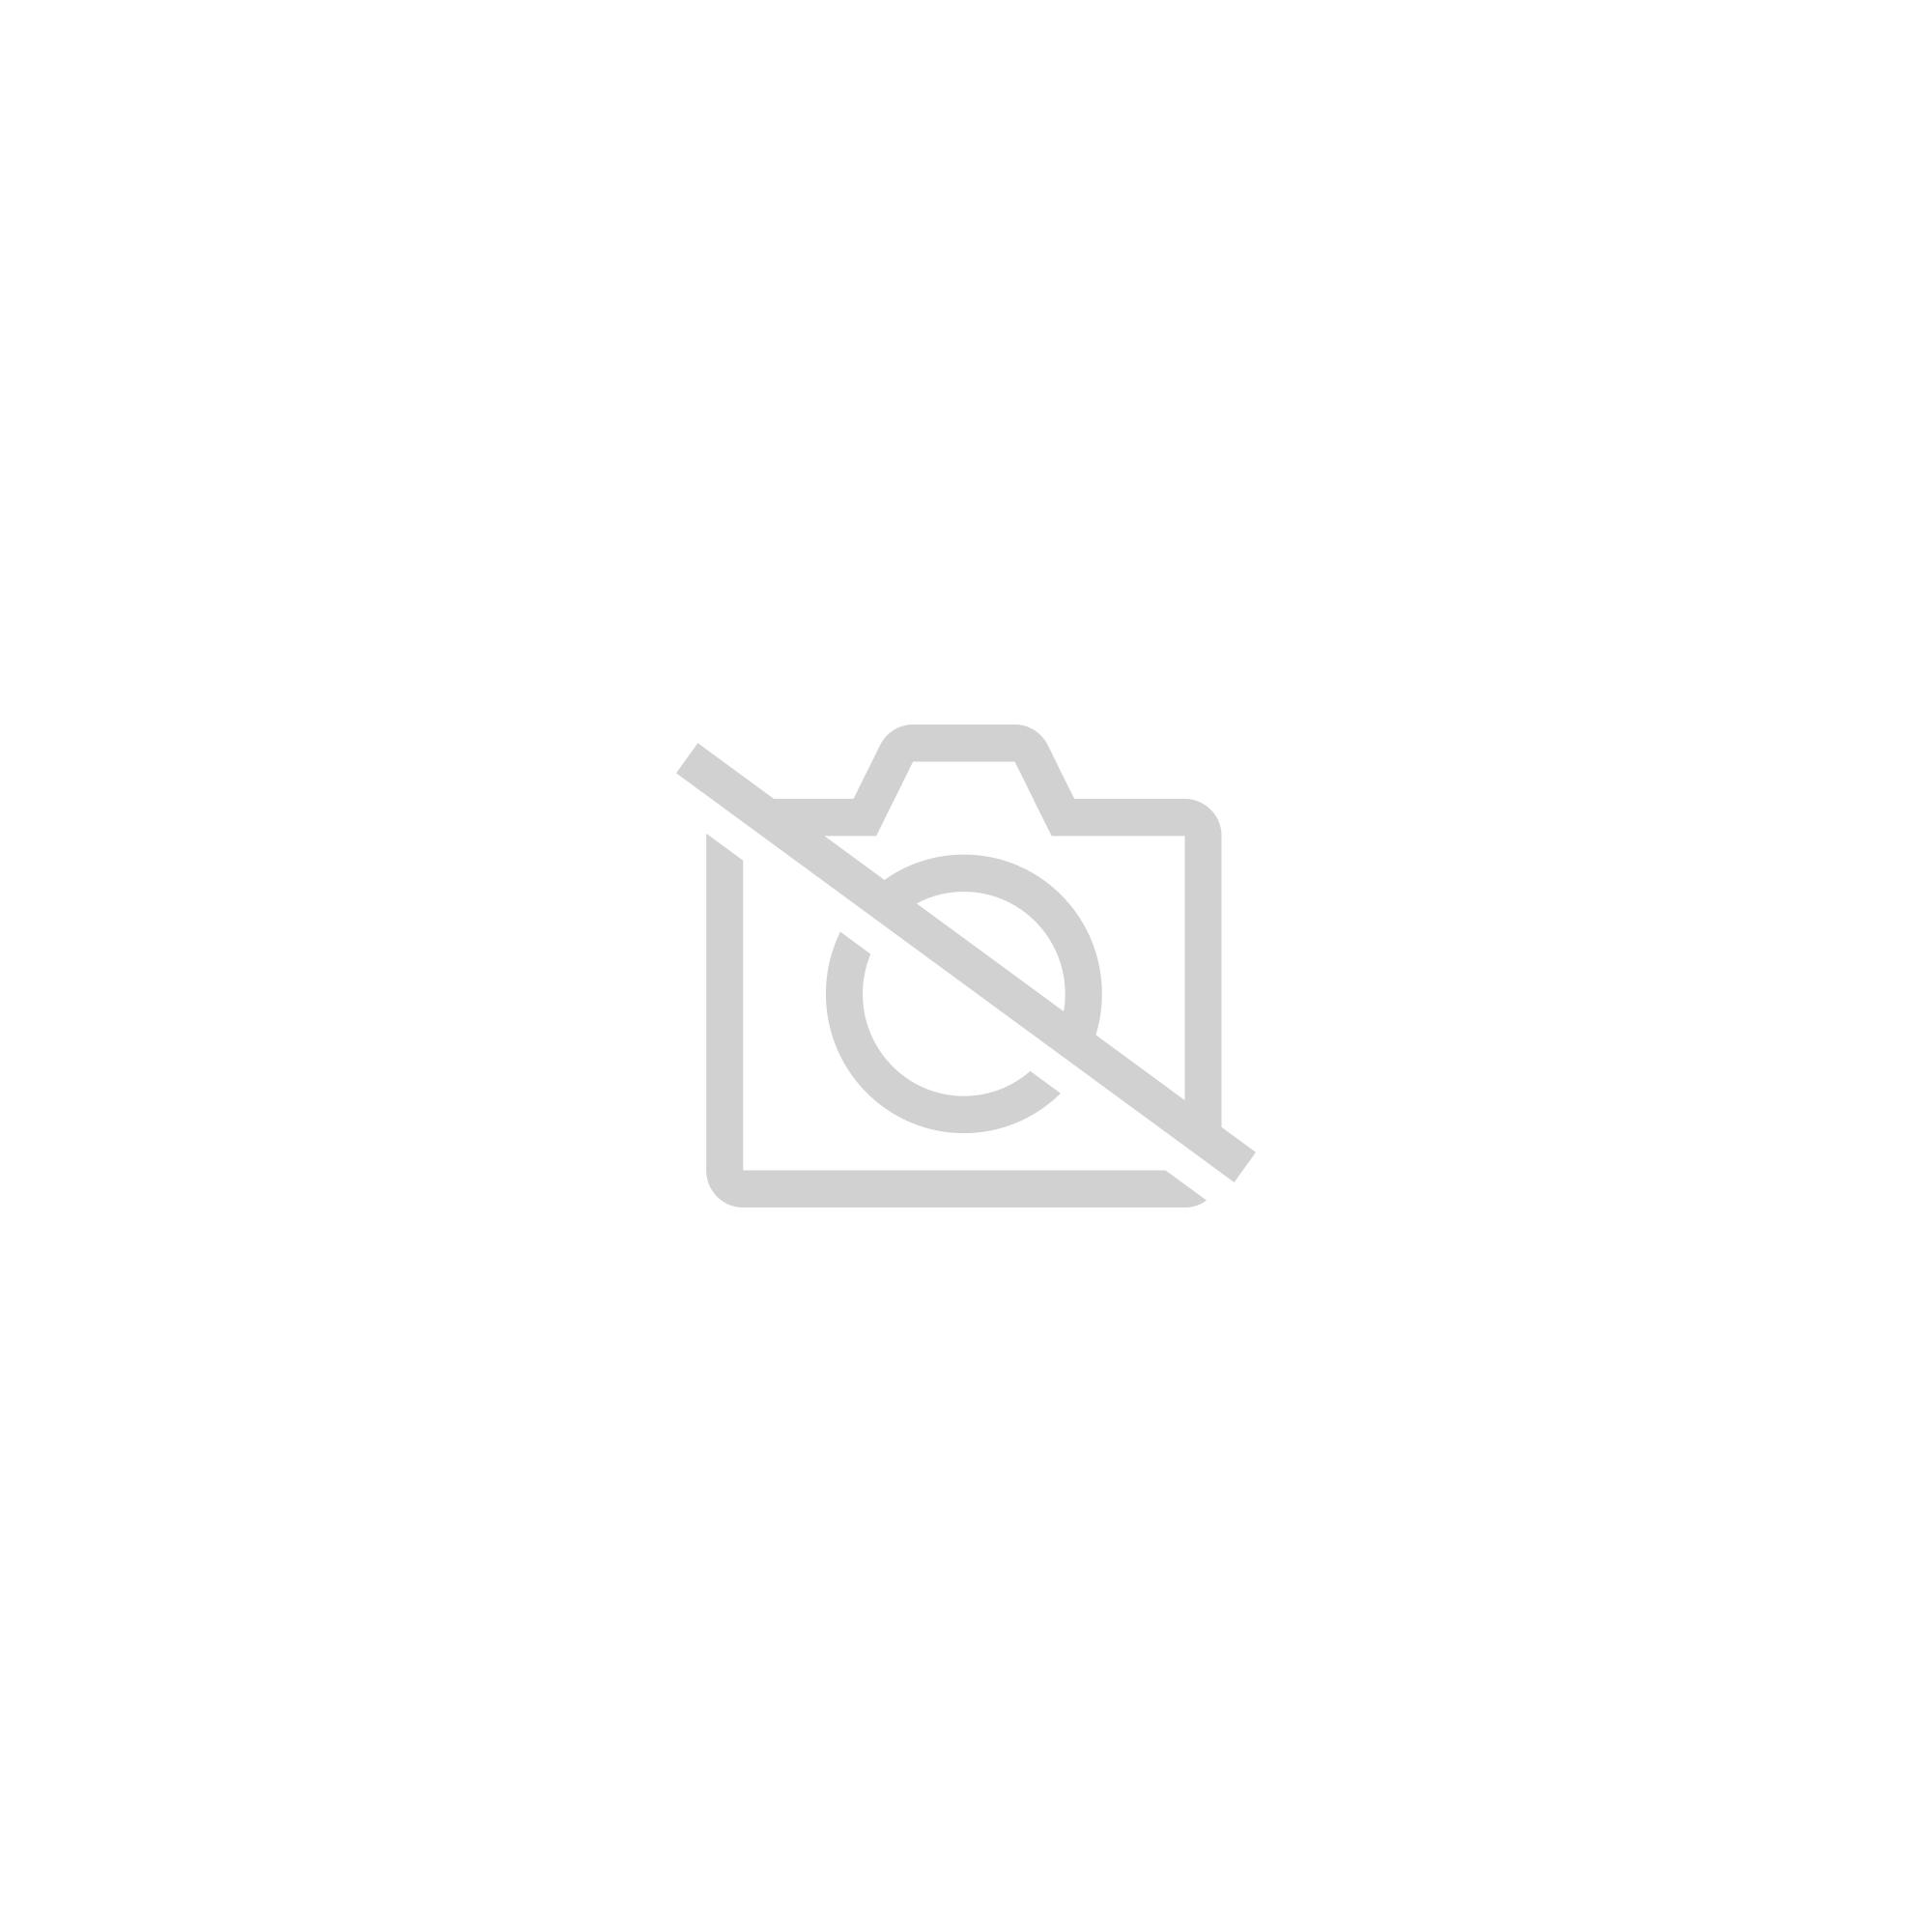 Air Jordan Sweat-Shirt Jumpman Graphic Brushed Crewneck - 689014-011